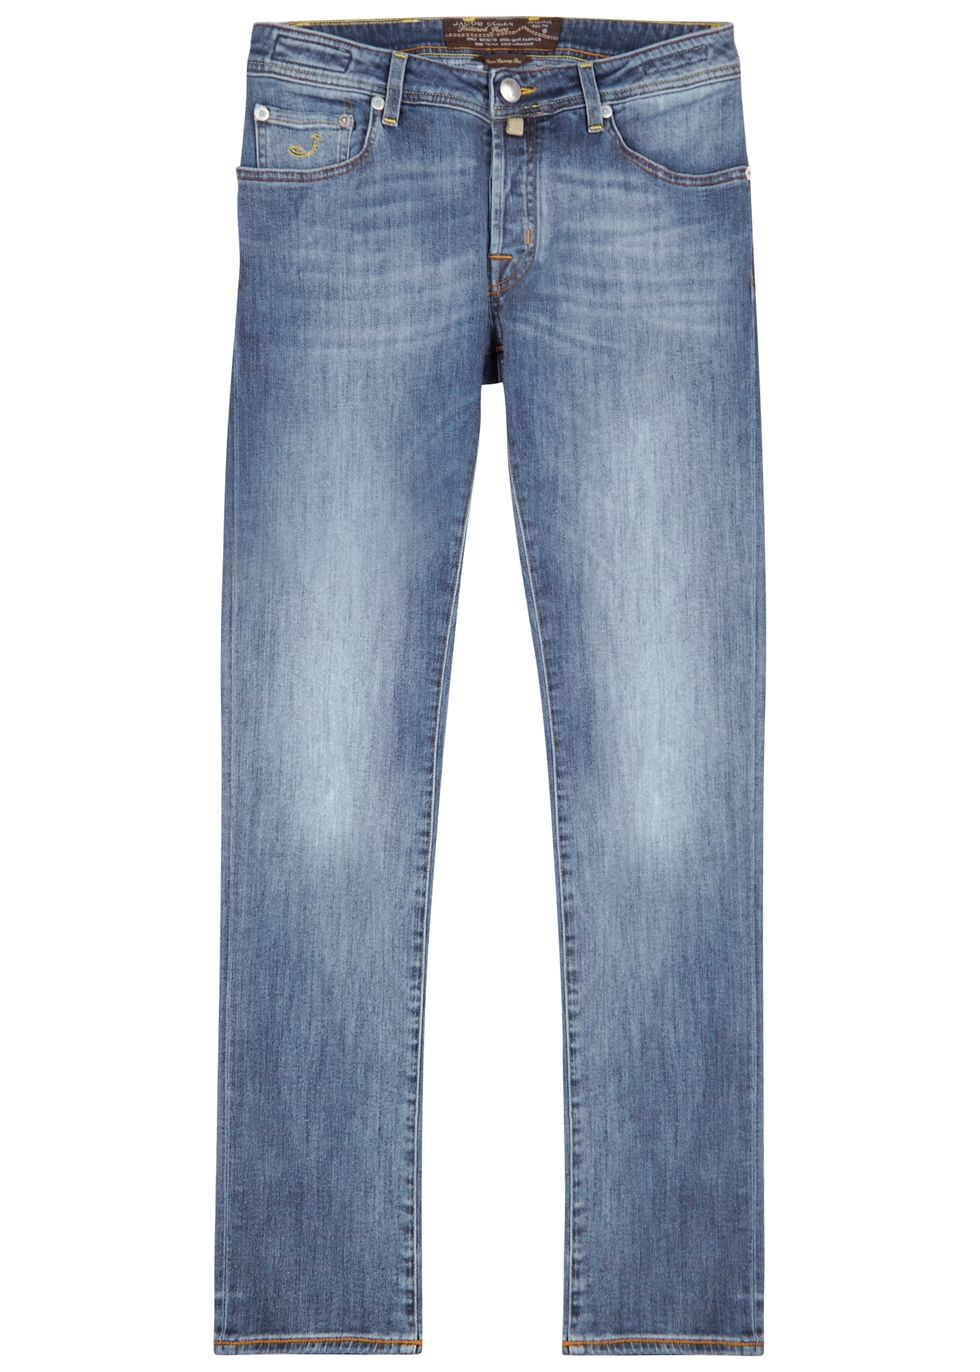 J622 light blue slim-leg jeans